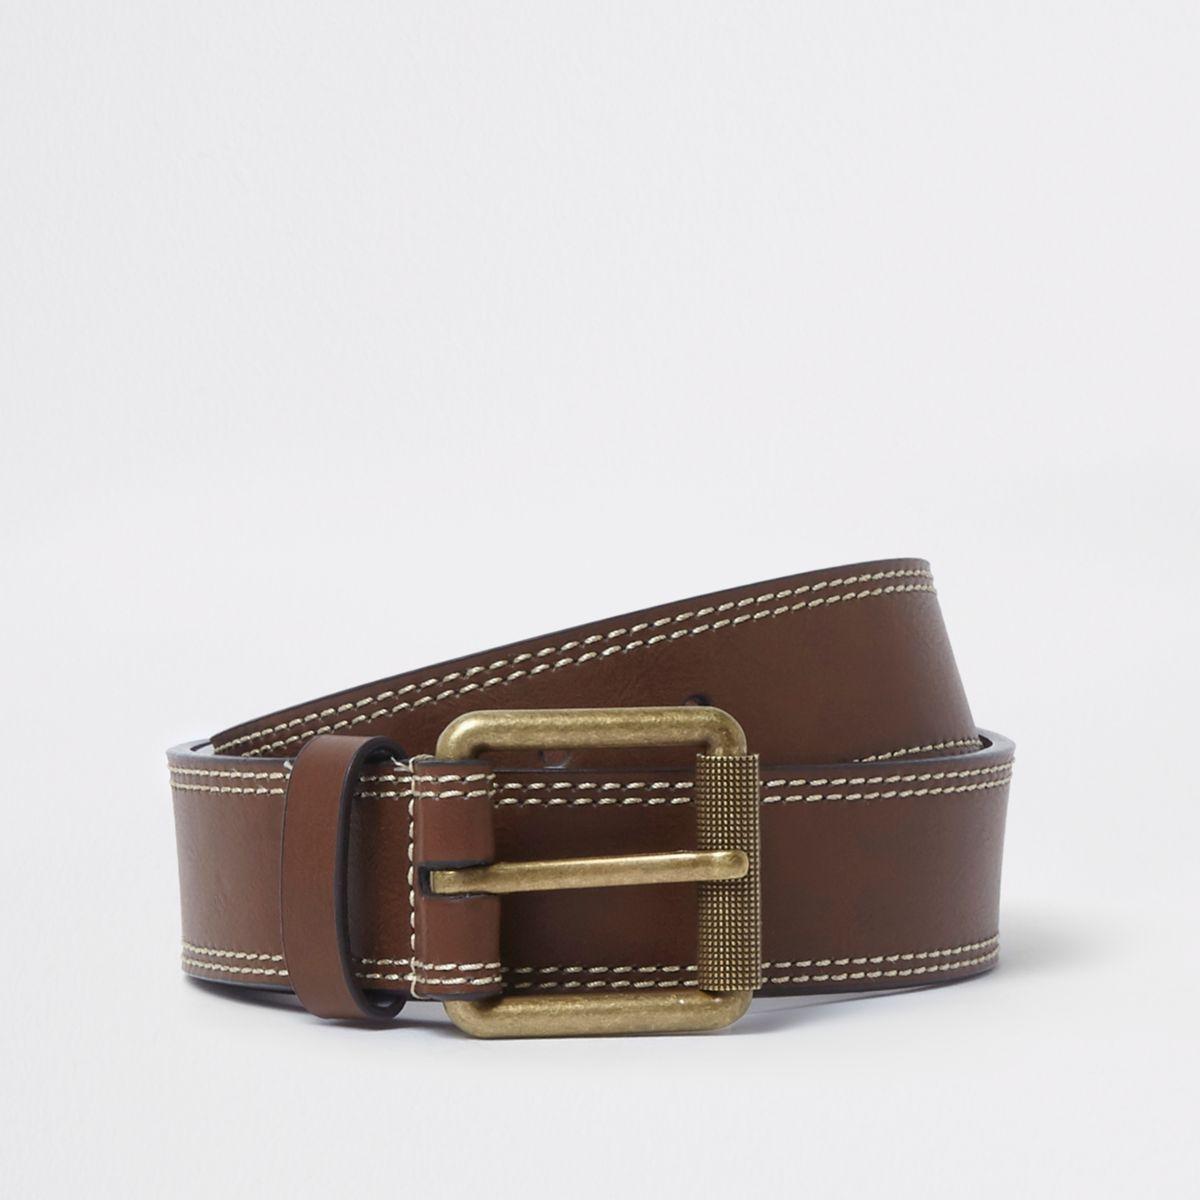 Light brown faux leather buckle belt